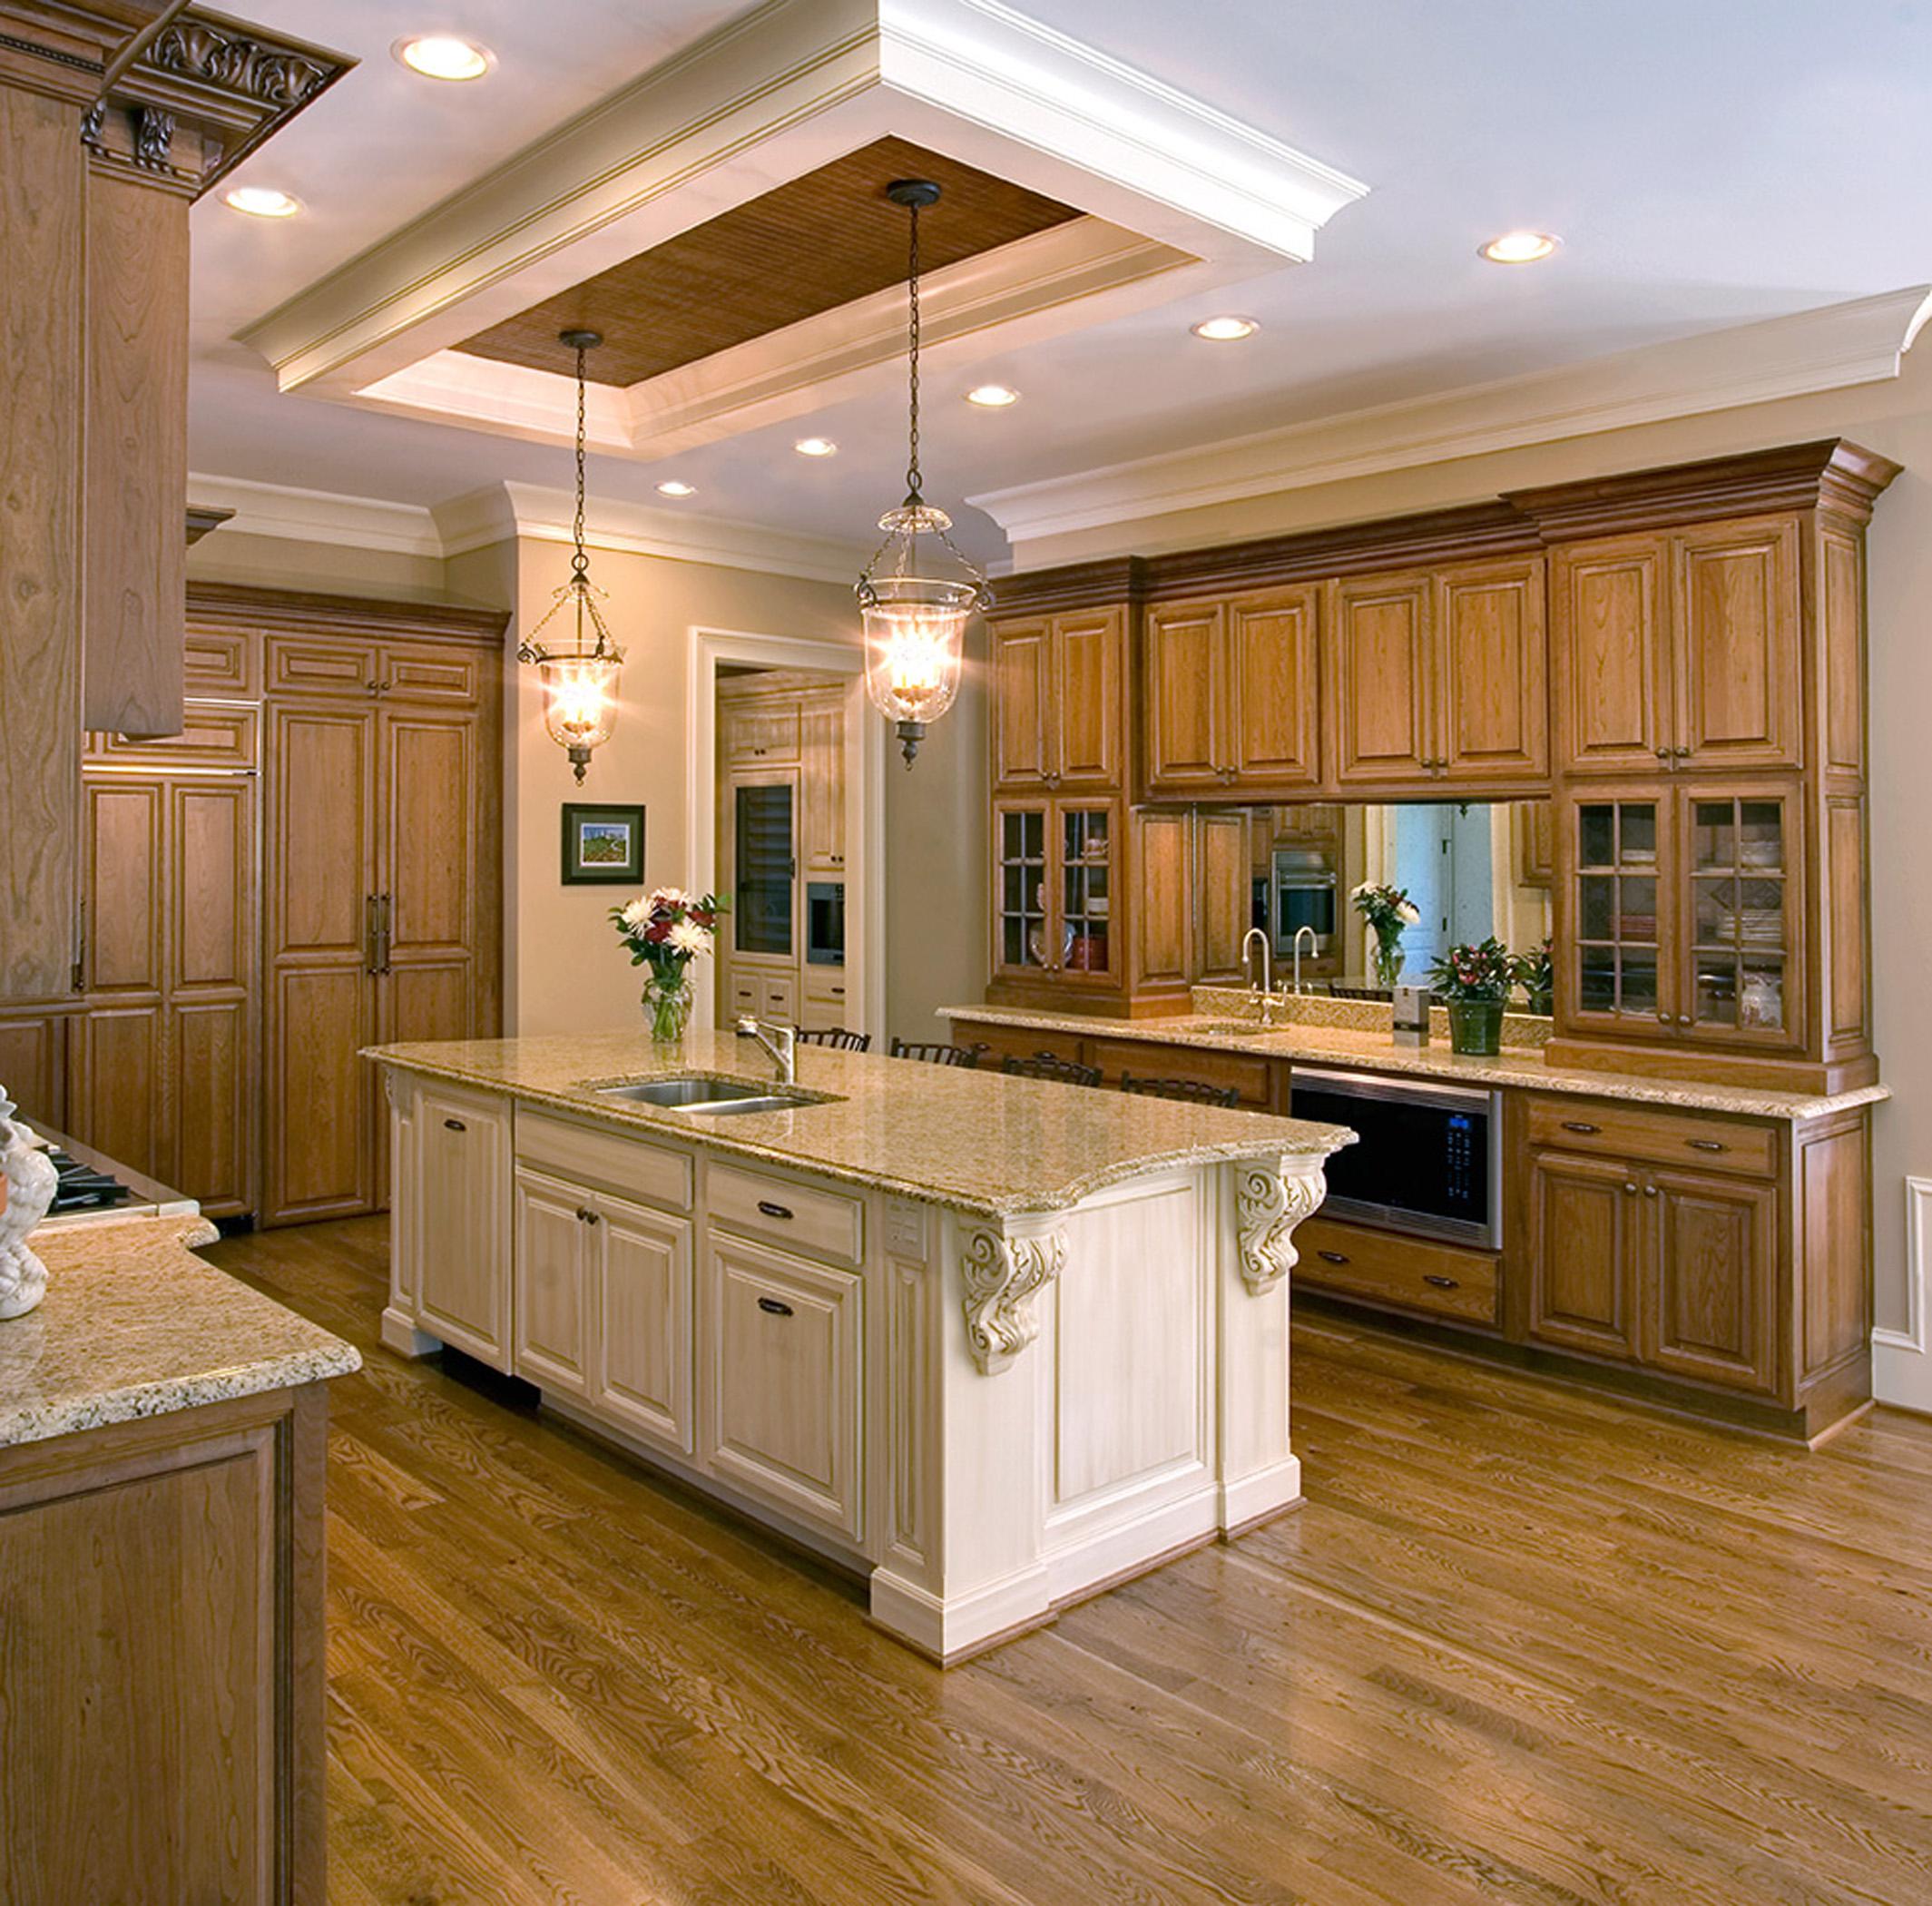 Pittsburgh Kitchens  Nelson Kitchen & Bath  Mars, Pa